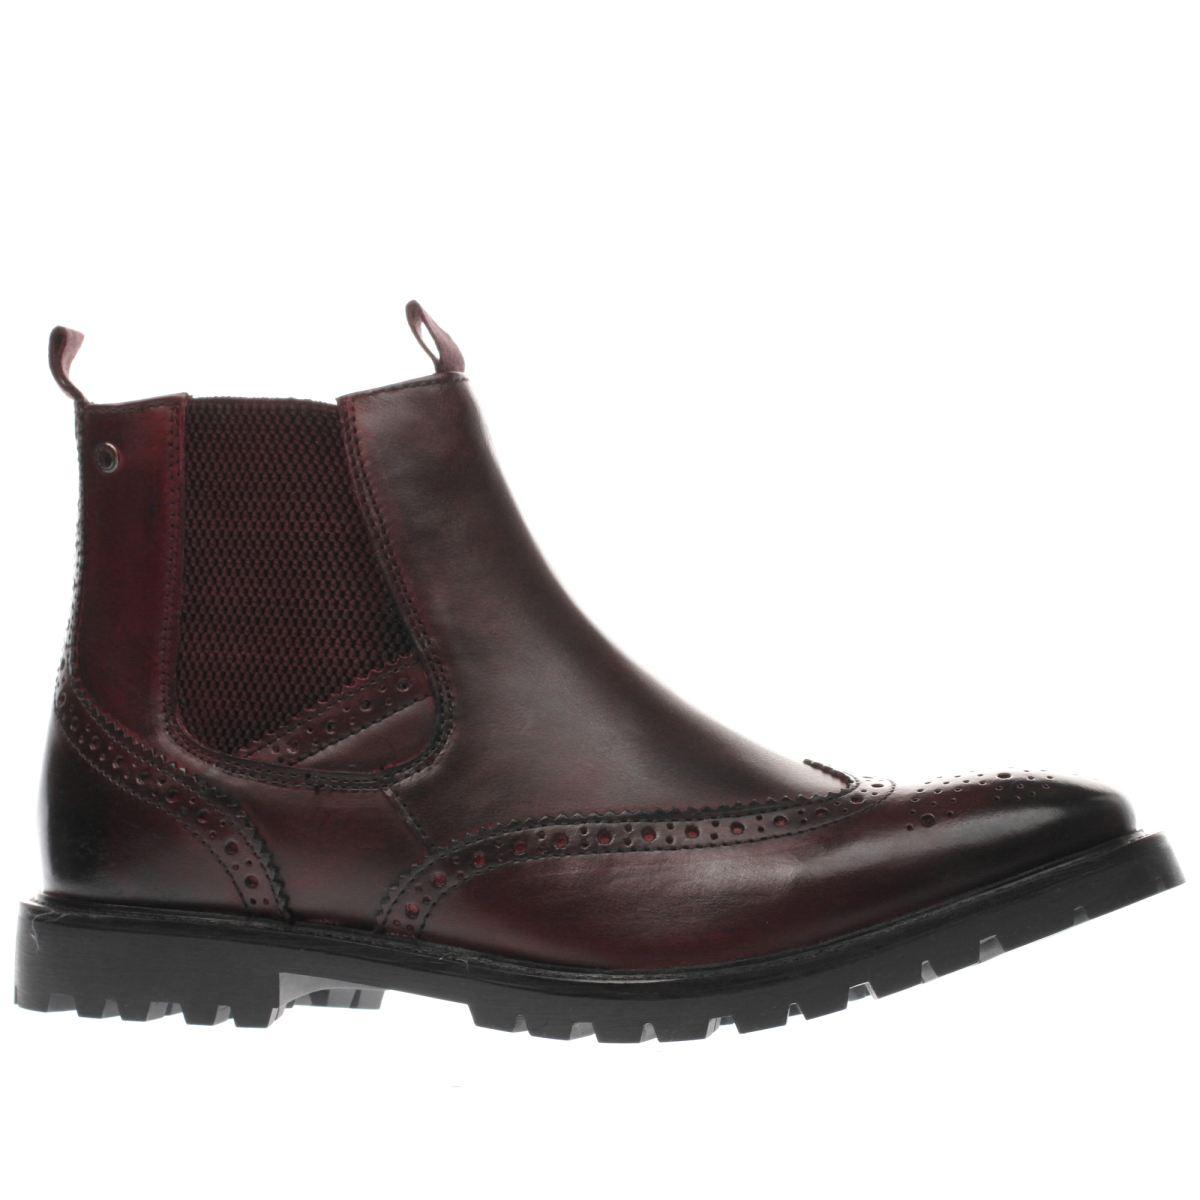 base london burgundy bosworth boots